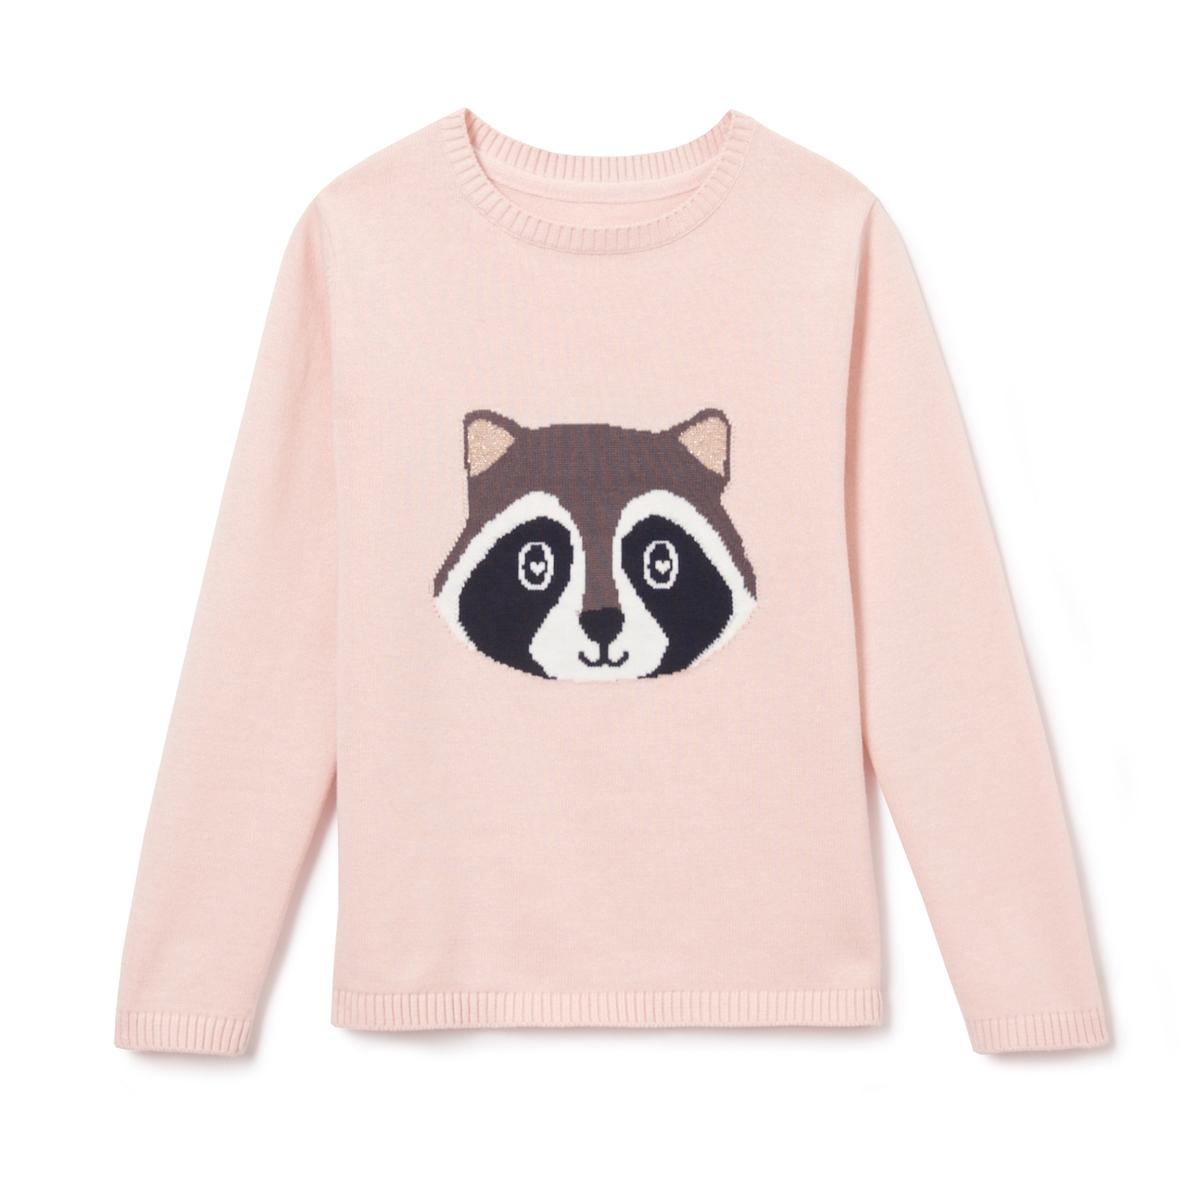 Пуловер с рисунком енот 3-12 лет